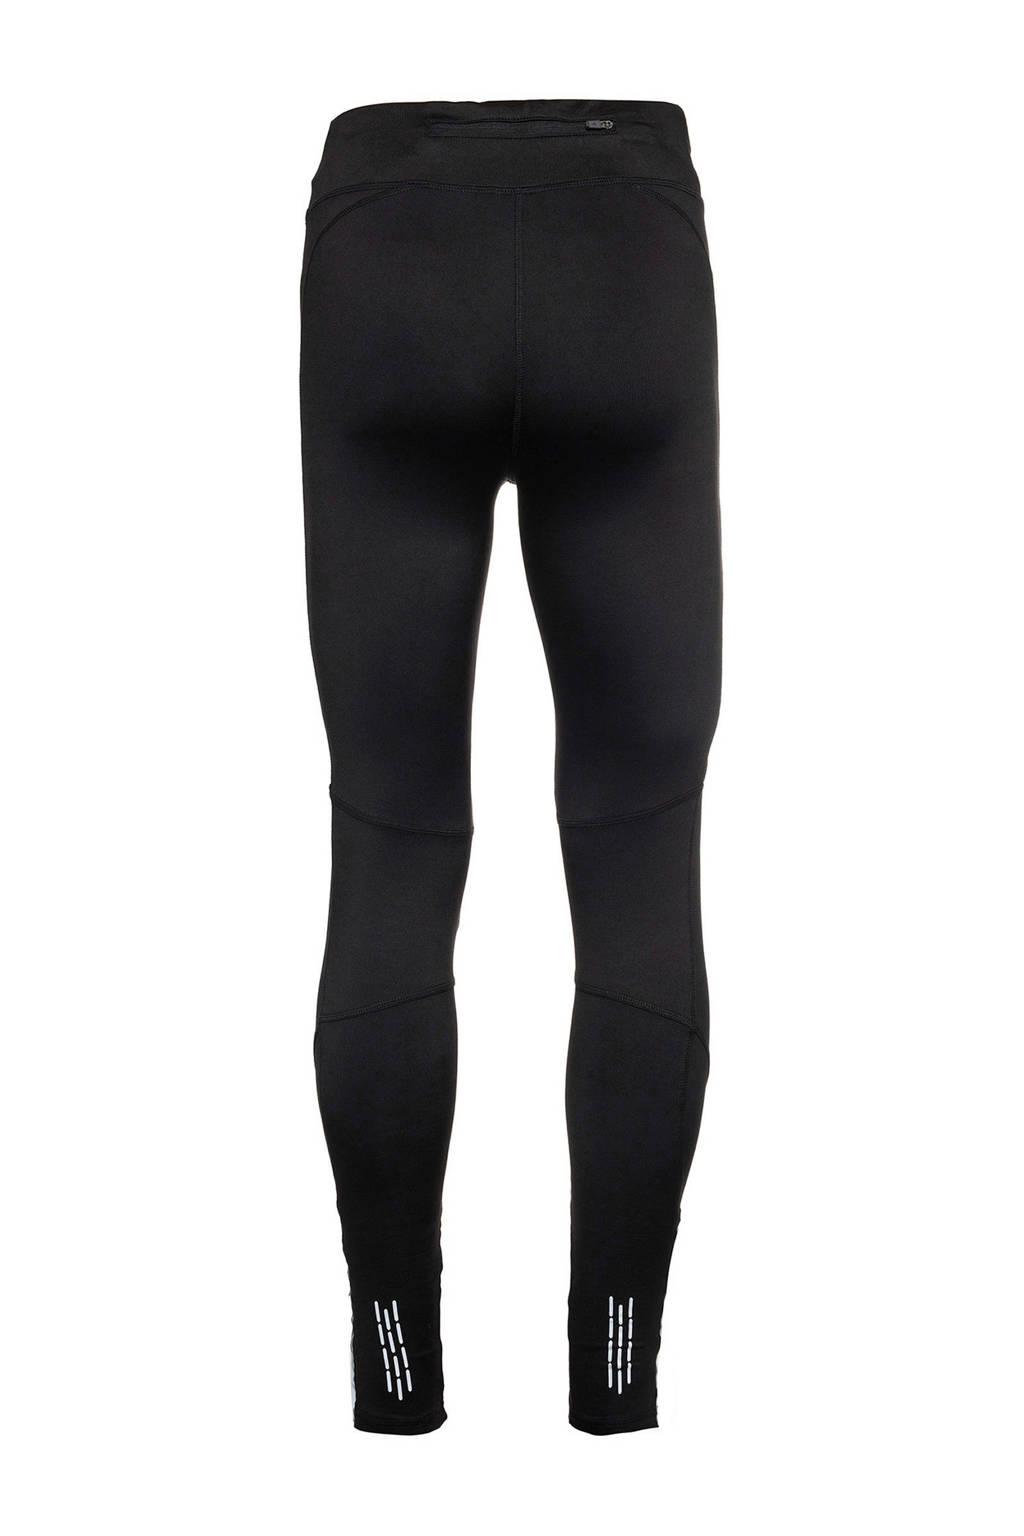 Scapino Osaga Pro   sportbroek zwart, Zwart